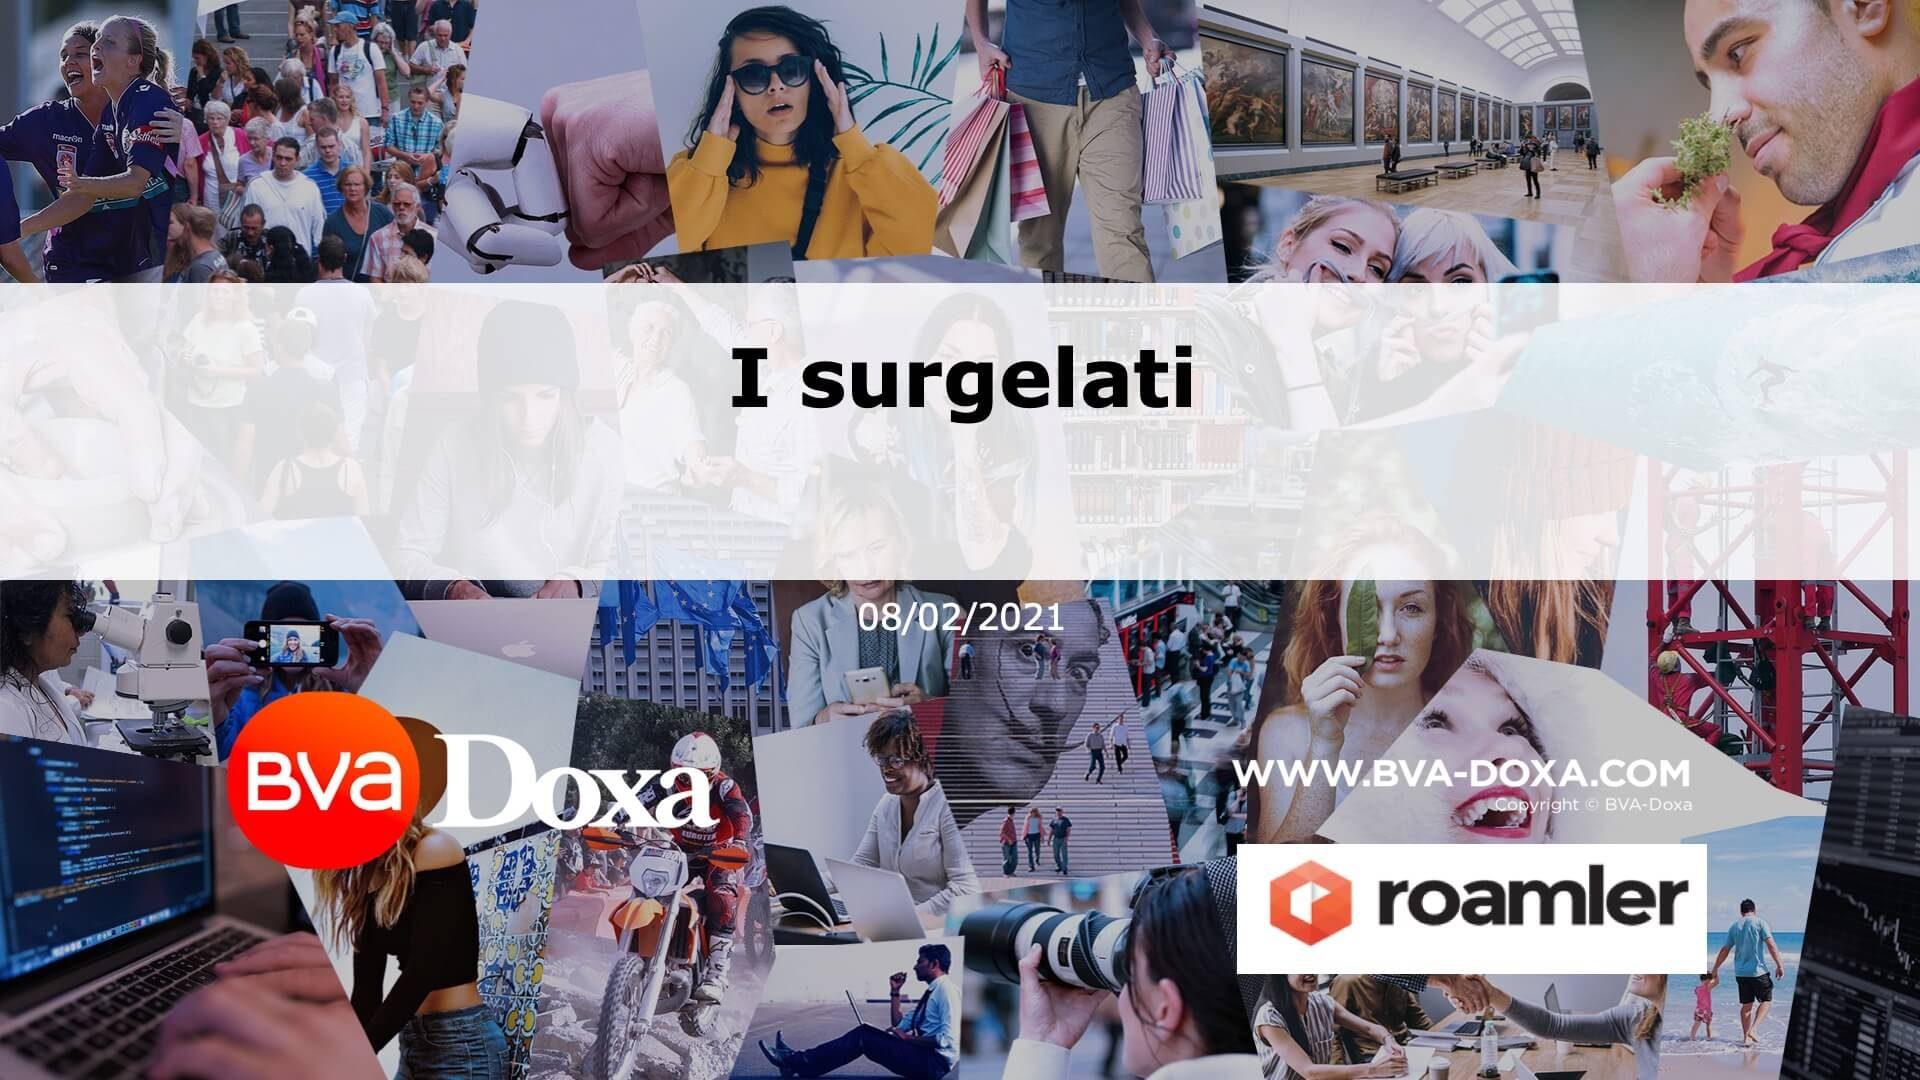 Bva Doxa Report Surgelati 2021 01